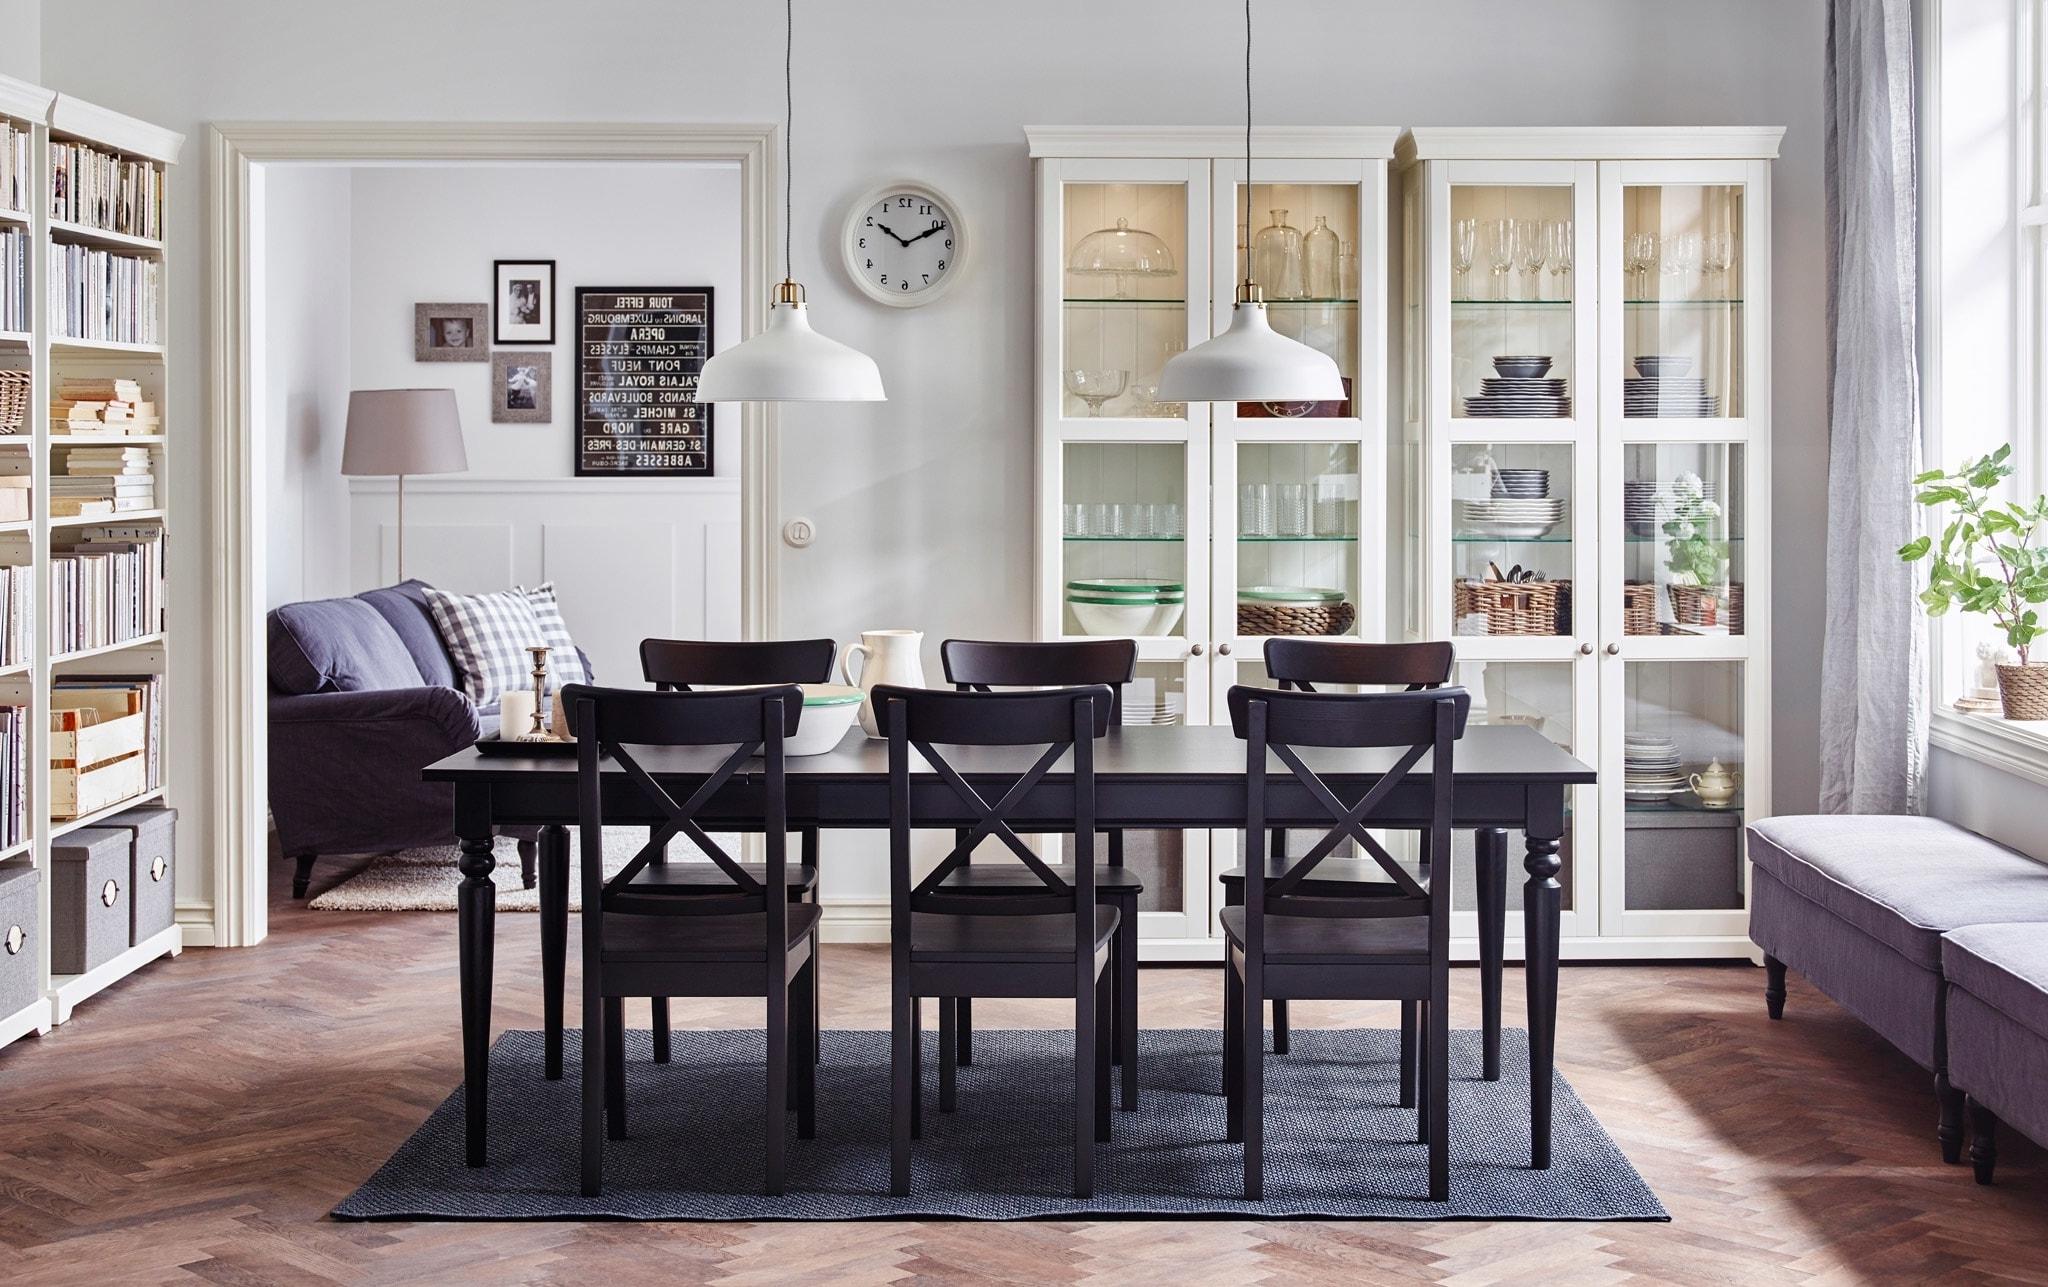 Dining Room Furniture & Ideas